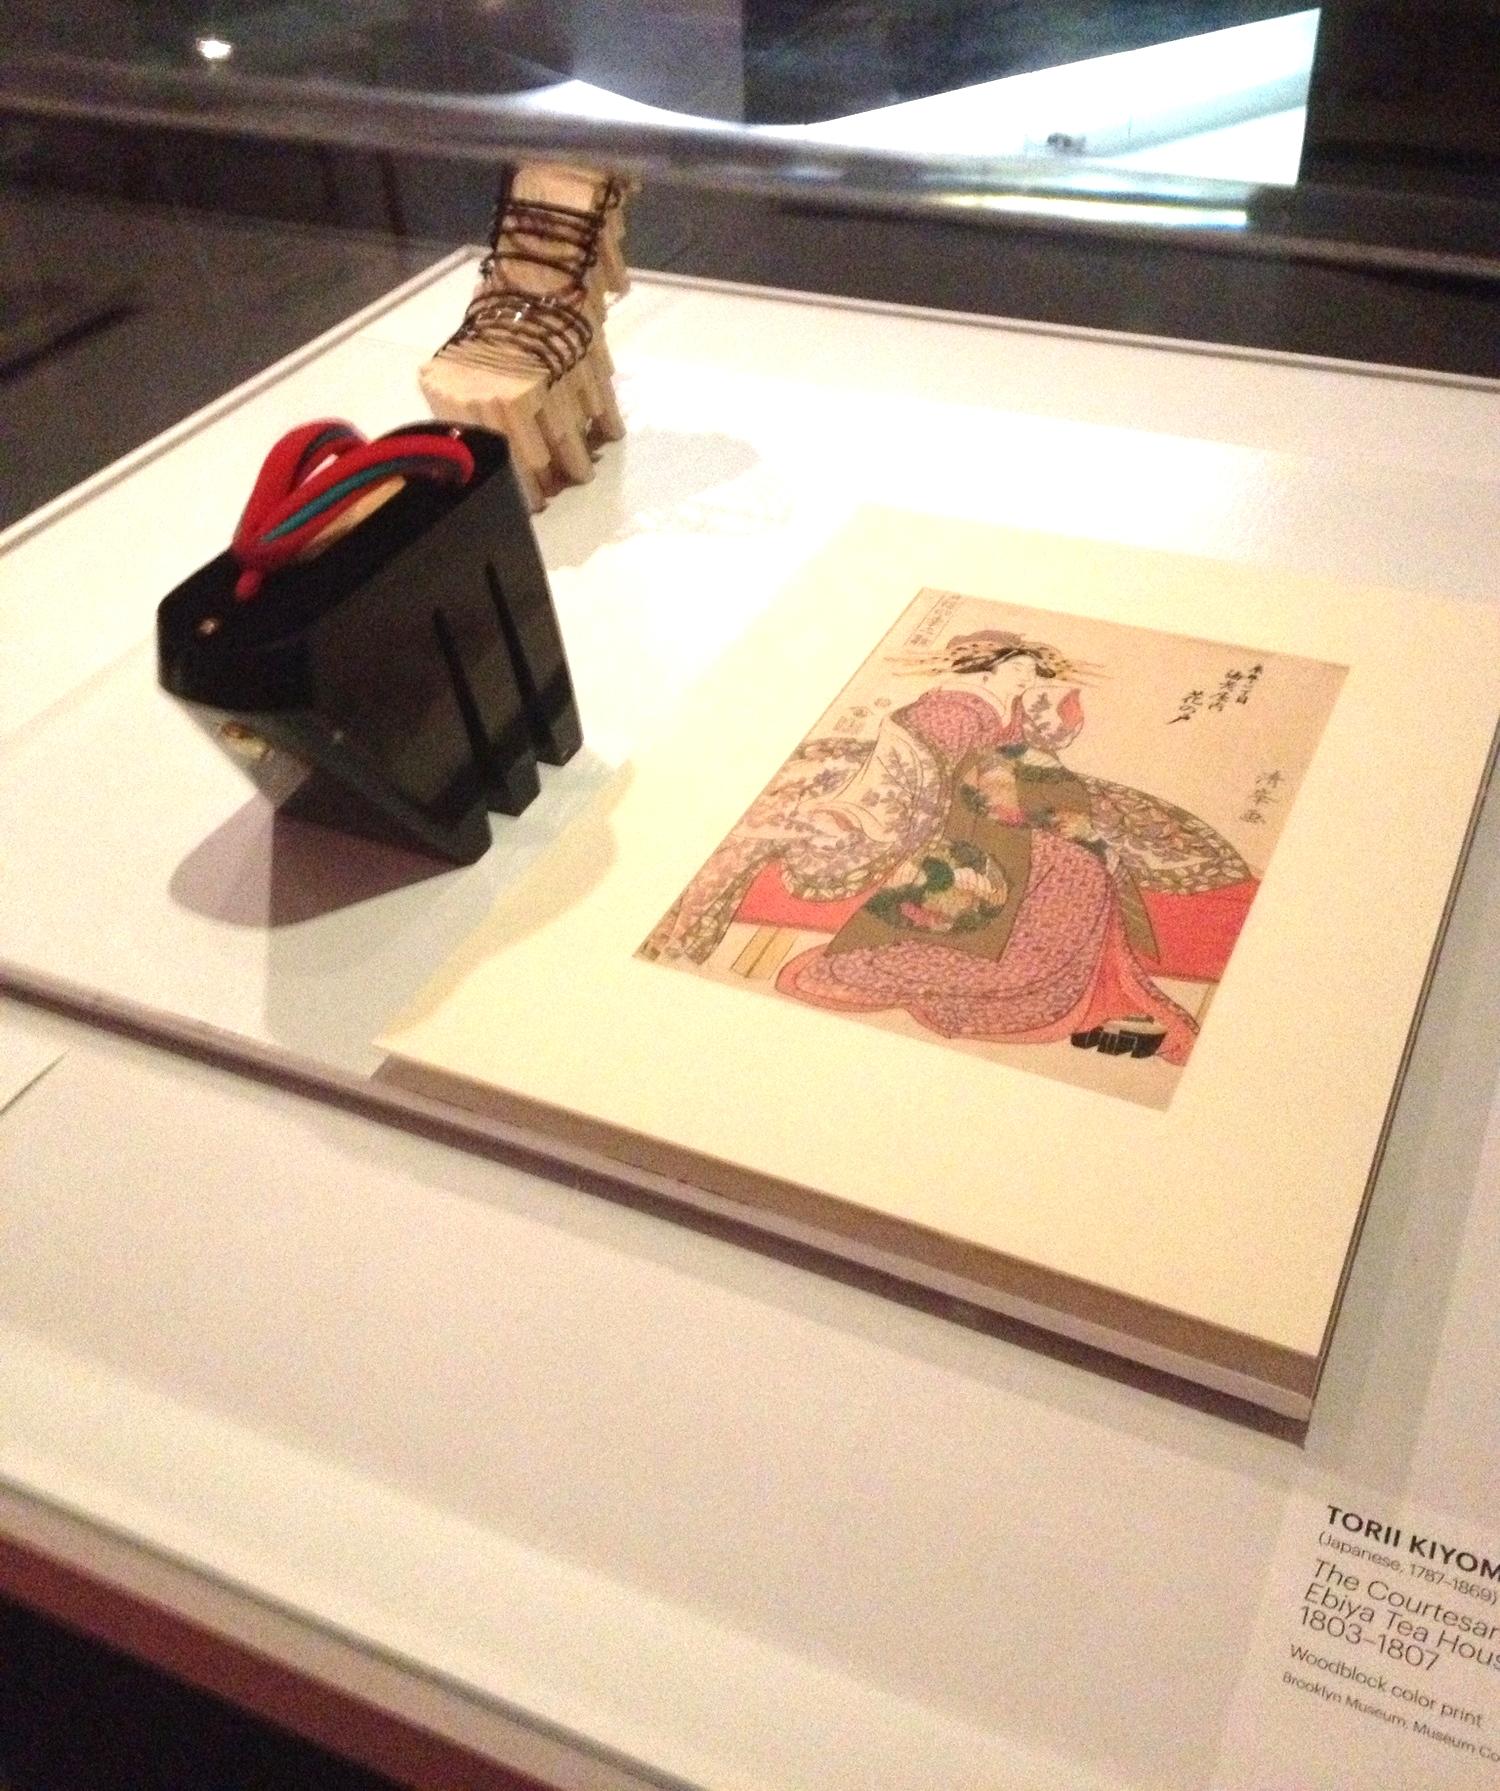 Japanese Shoe & Print, 1803-1807